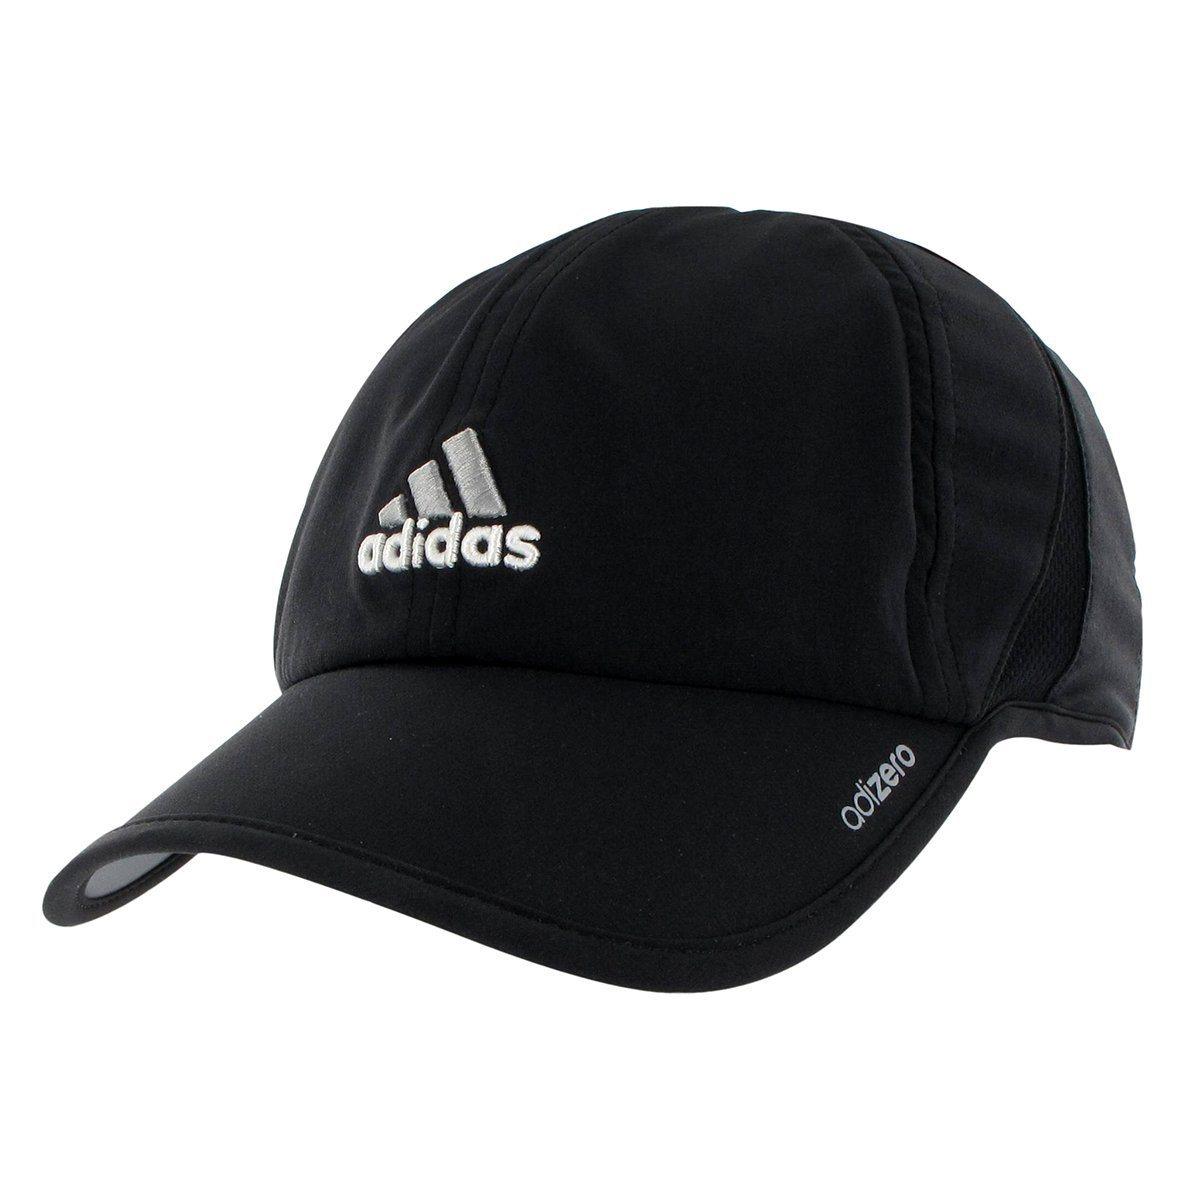 2016 Small MOQ Customized Cap for Promotional Baseball Cap Hat